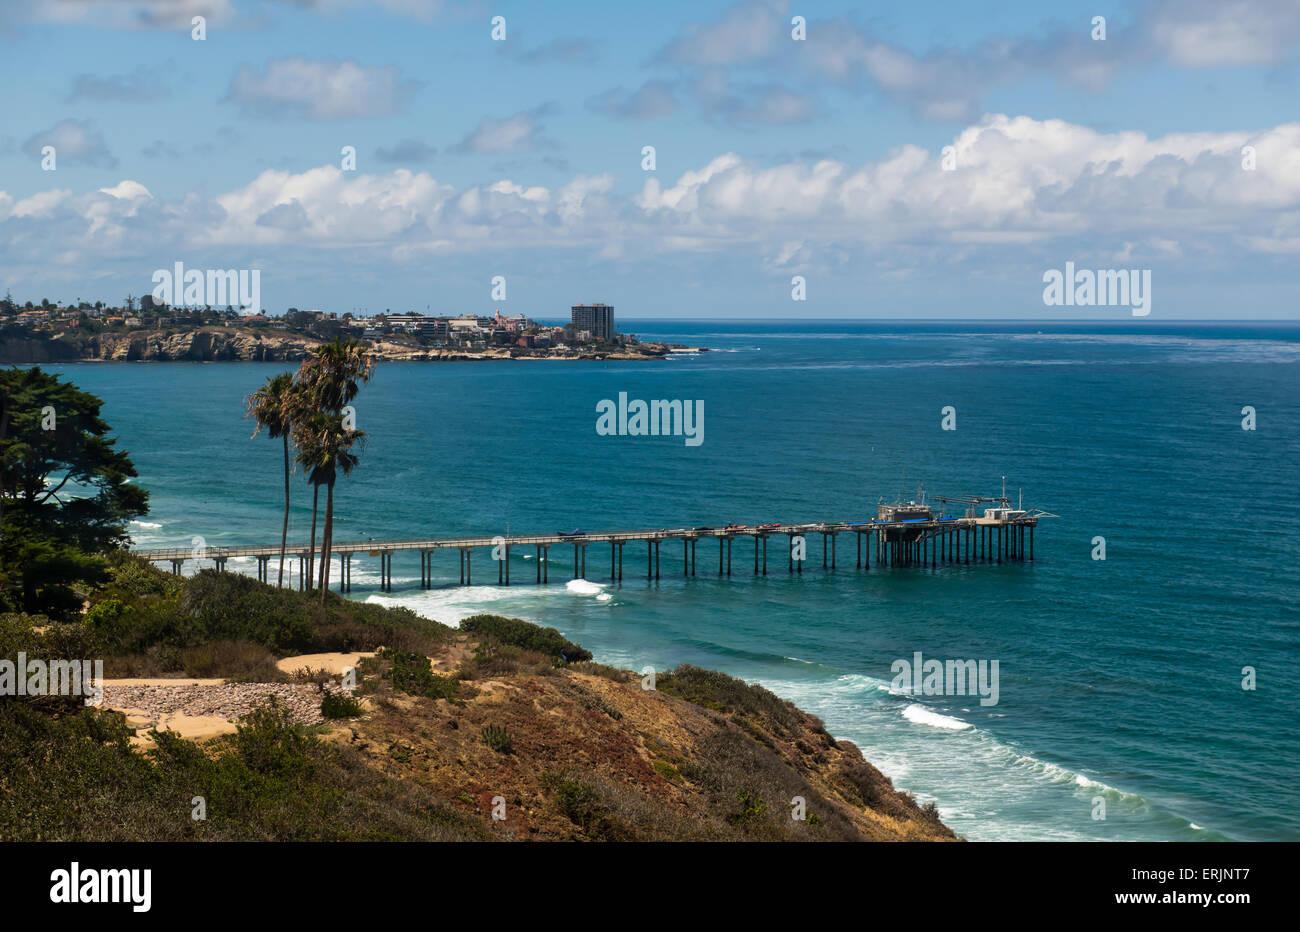 Scripps Pier, La Jolla, Califonia - Stock Image